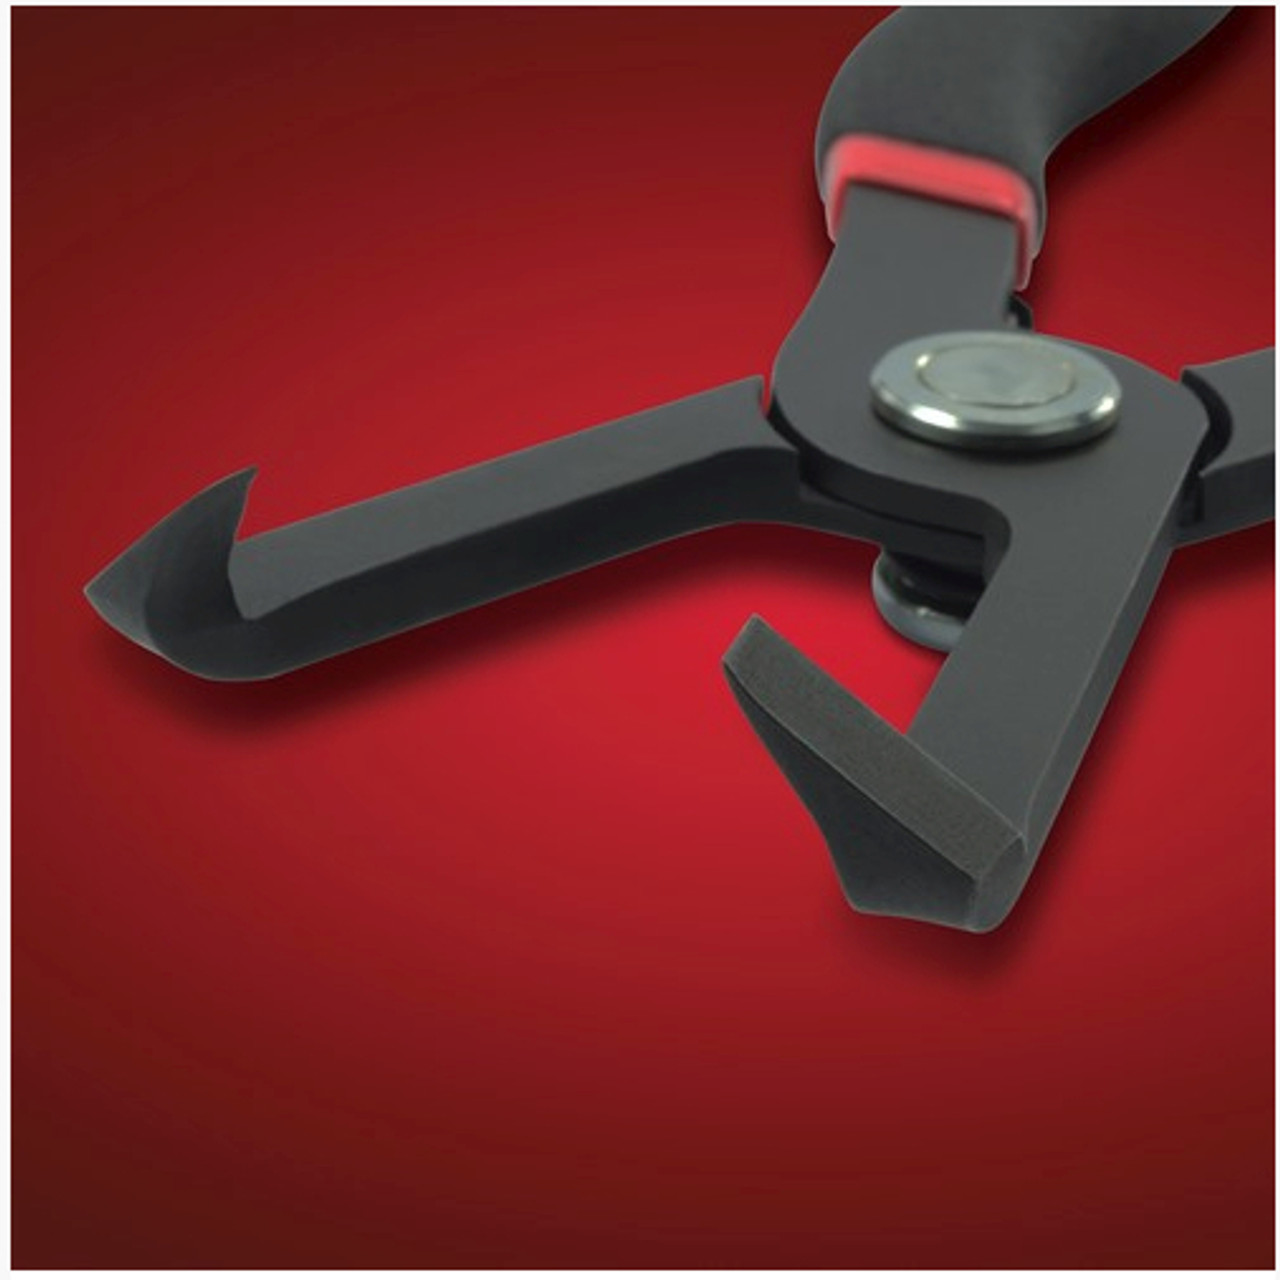 Show Chrome® Push Pin Pliers & Push Pin Combo (SC-3120-4005) Lamonster Approved